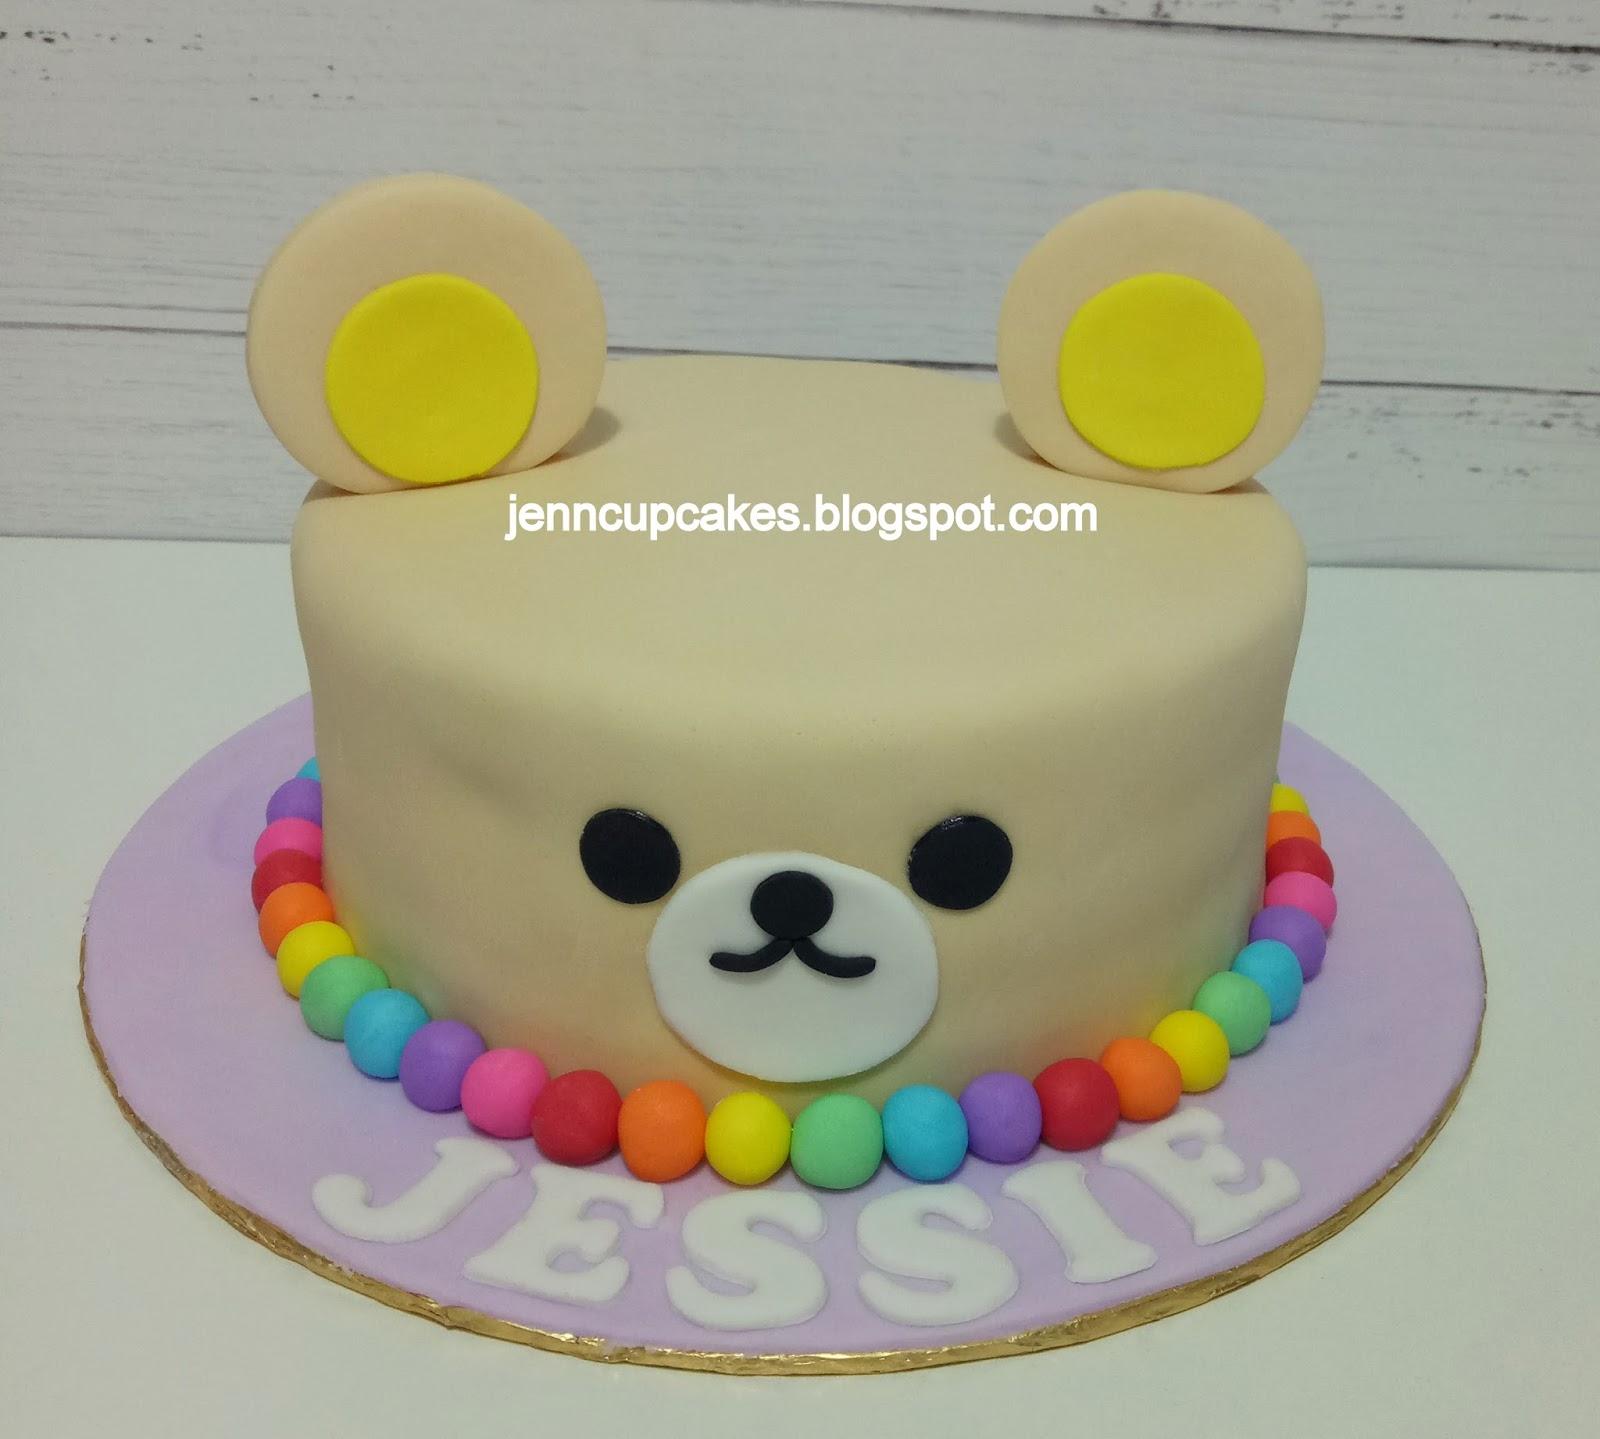 Jenn Cupcakes Muffins Rilakkuma Cake